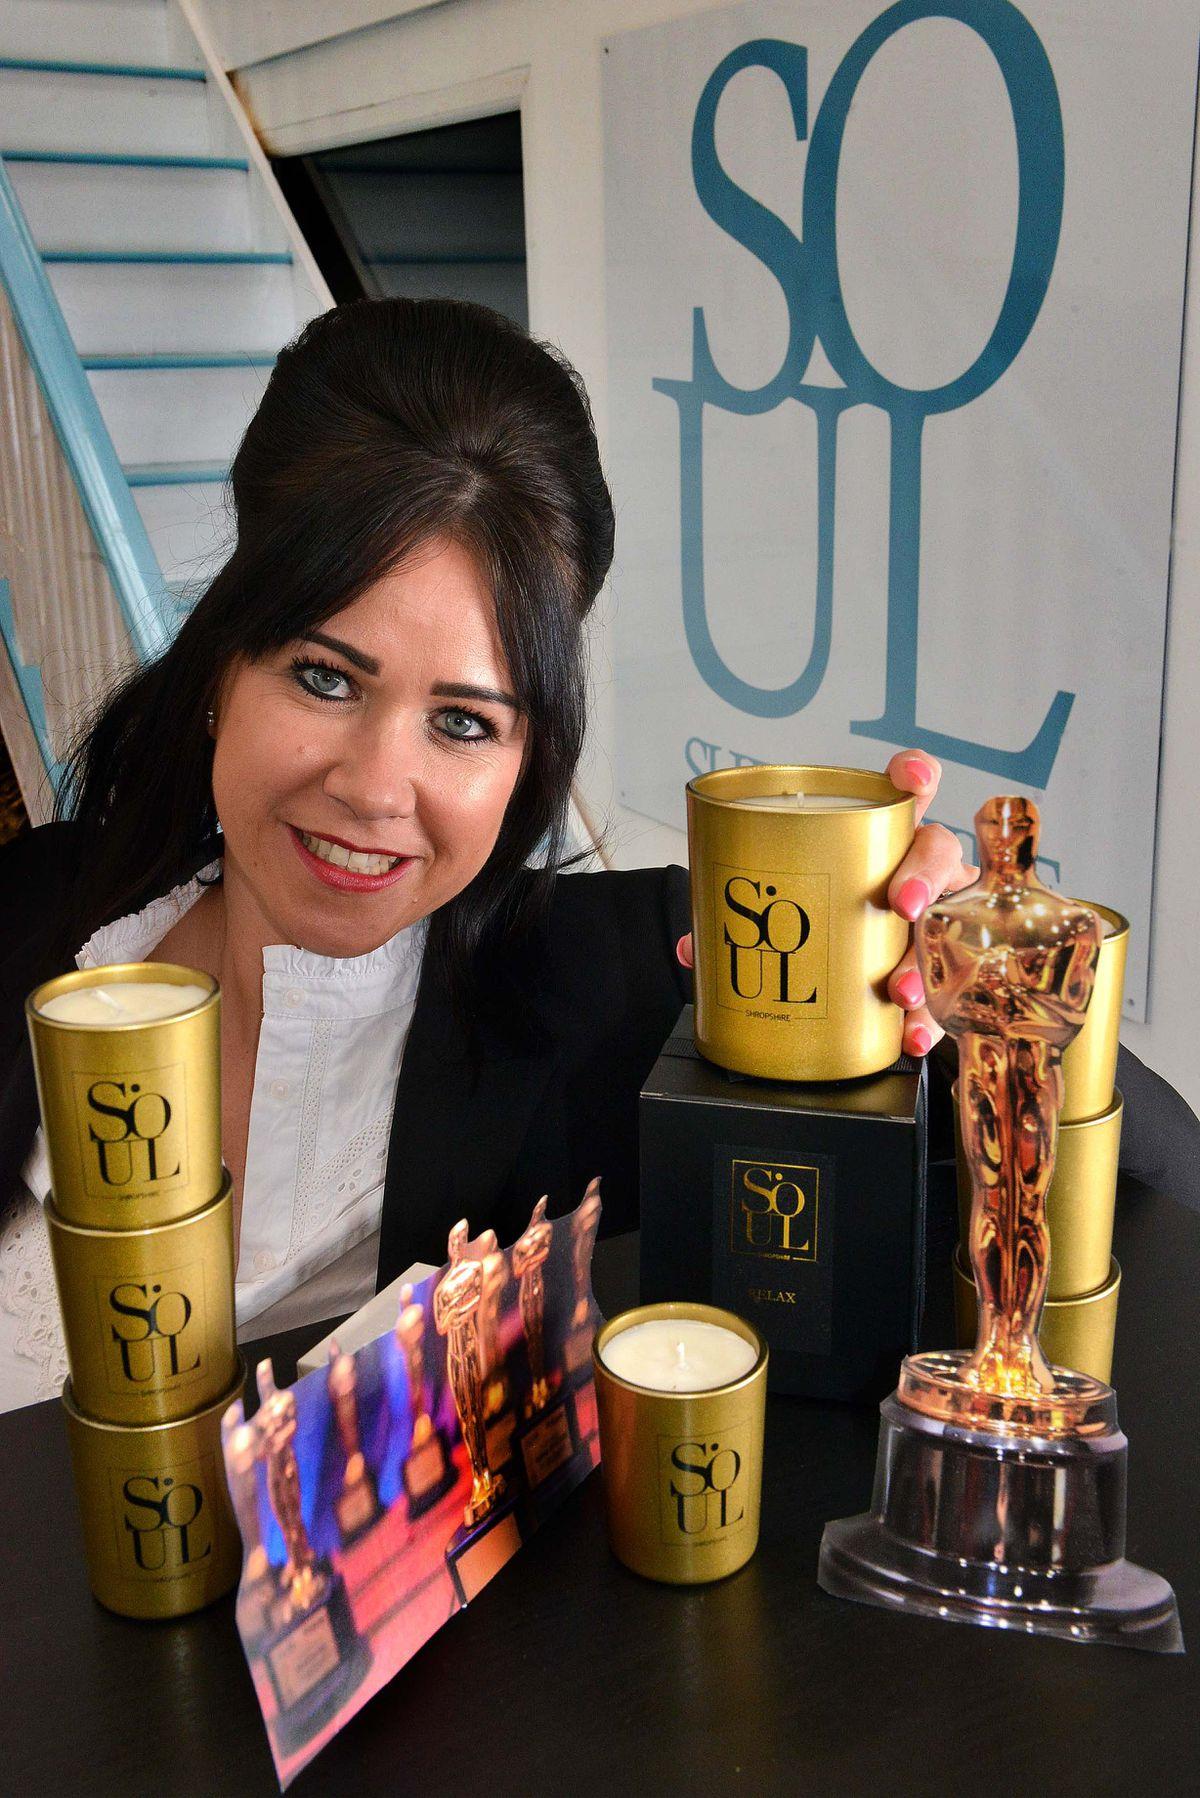 Gemma Vujnovic, owner of Soul Shropshire